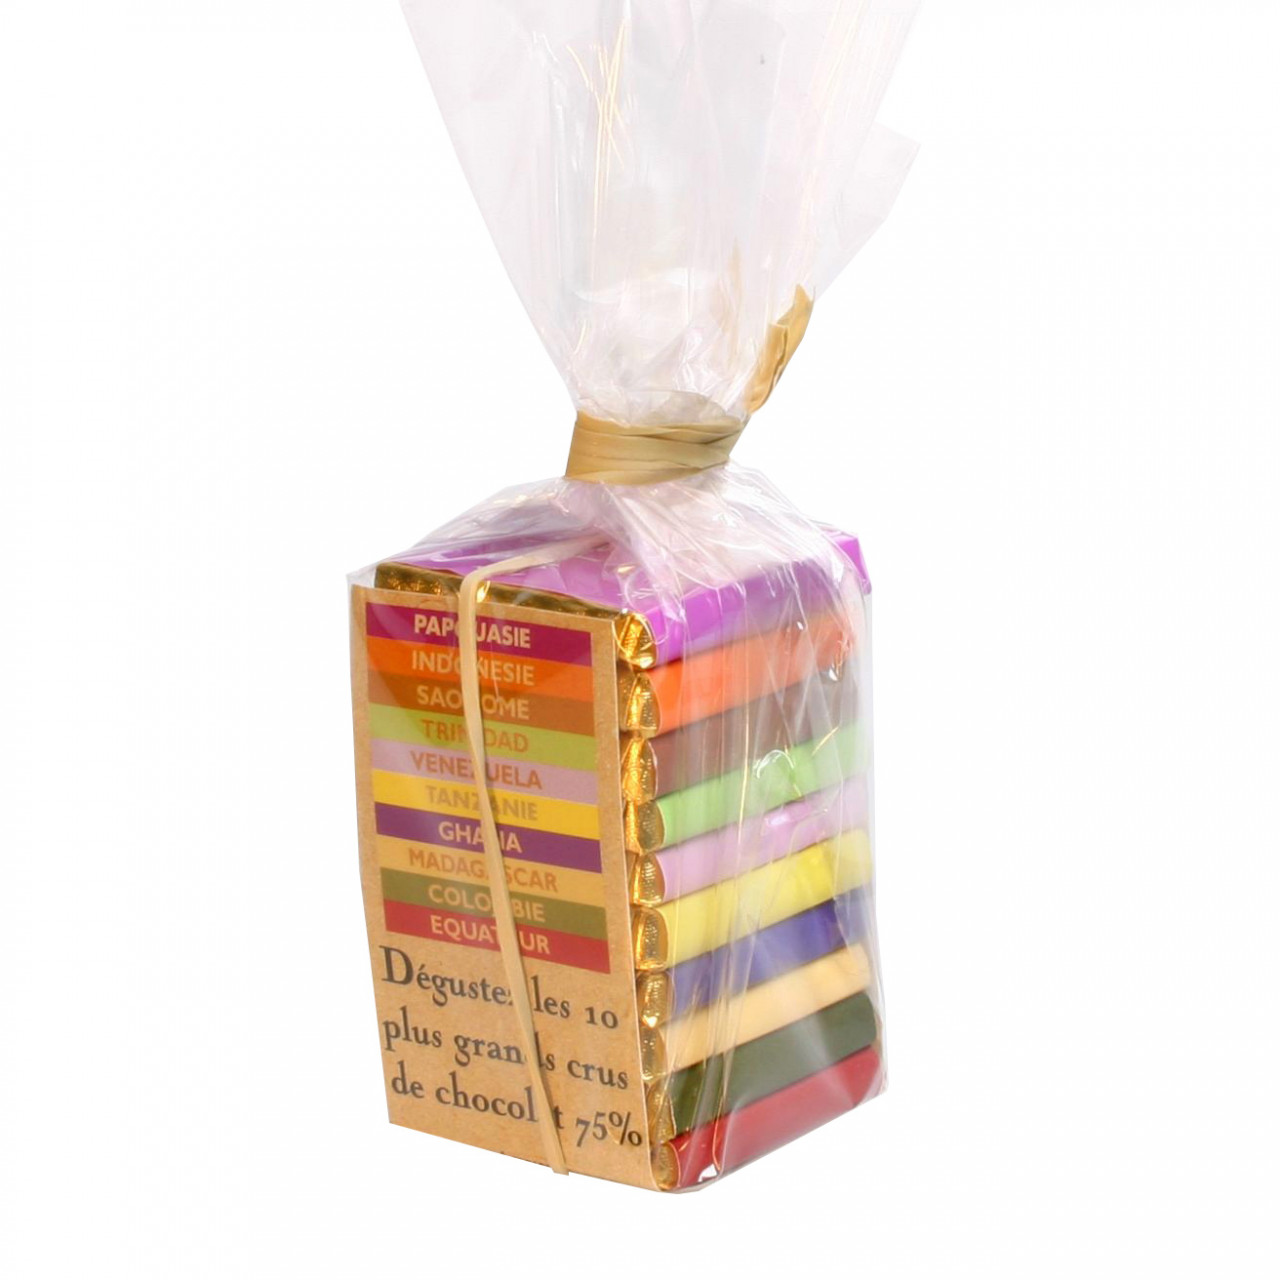 Dunkle Schokolade, Pyramide Pralus, dark chocolate, chocolat noir,                                                                                                                                       - Napolitains, Chocolate Squares, France, french chocolate, Chocolate with sugar - Chocolats-De-Luxe